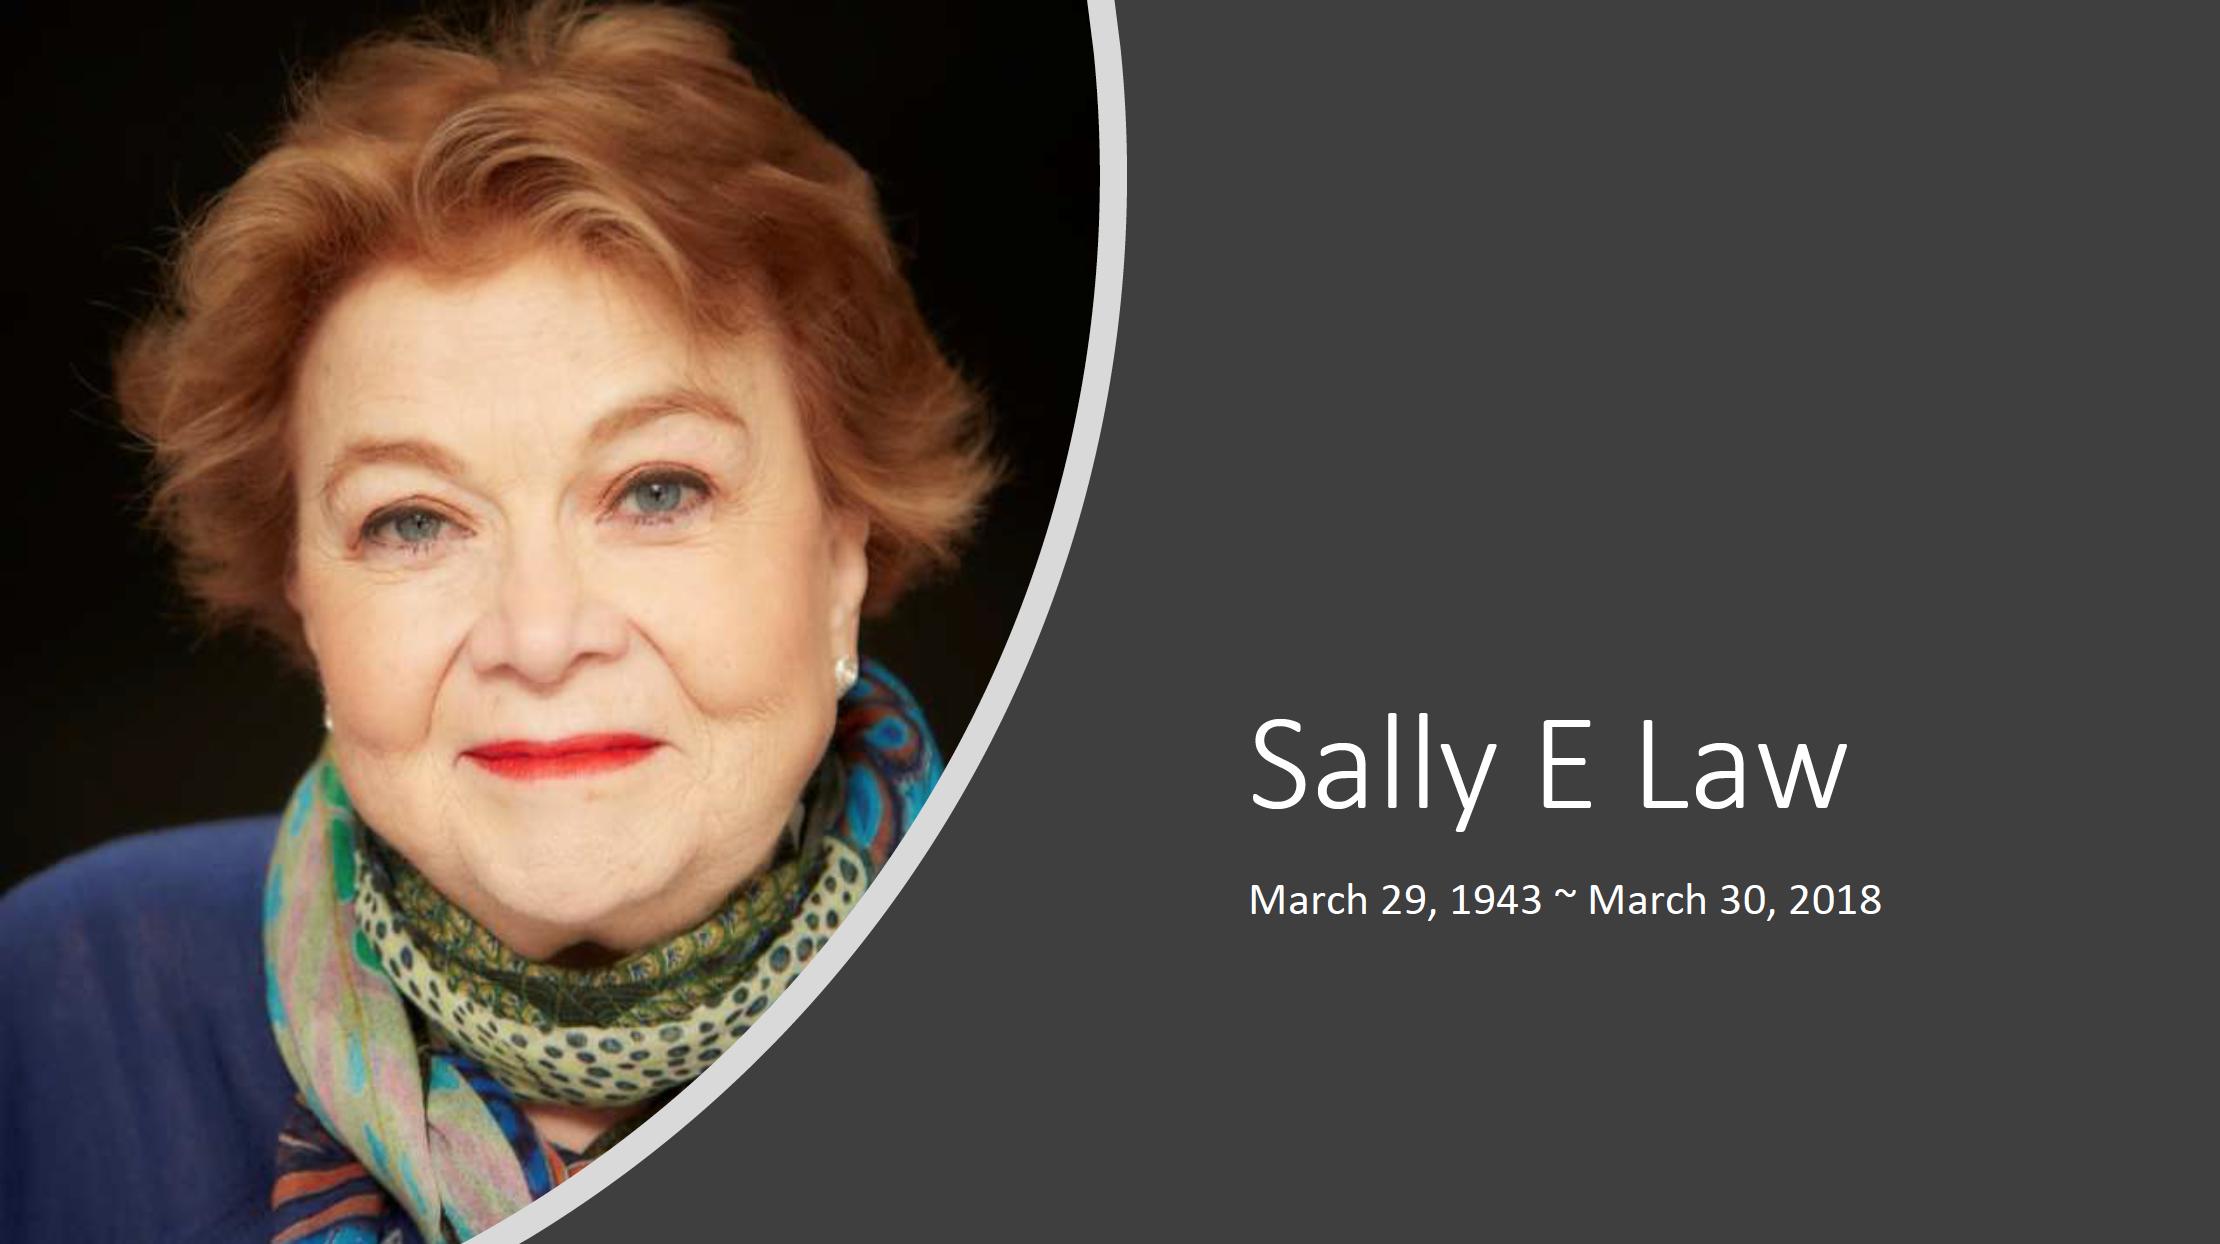 Sally Law WLA Vice President